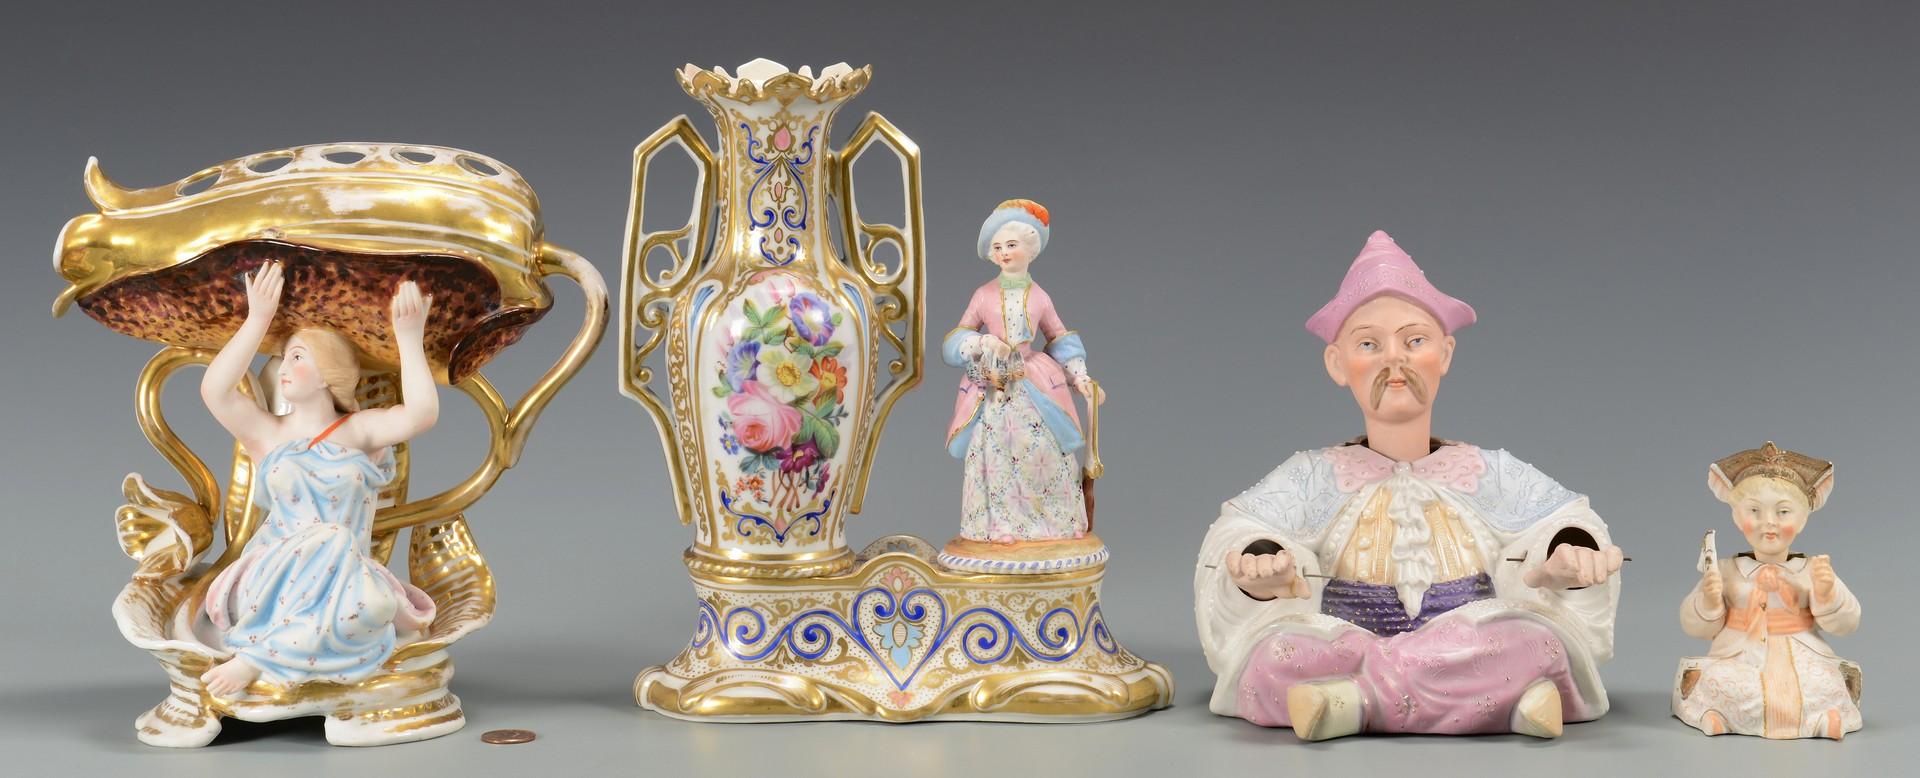 Lot 452: Figural porcelains and nodders, 4 items